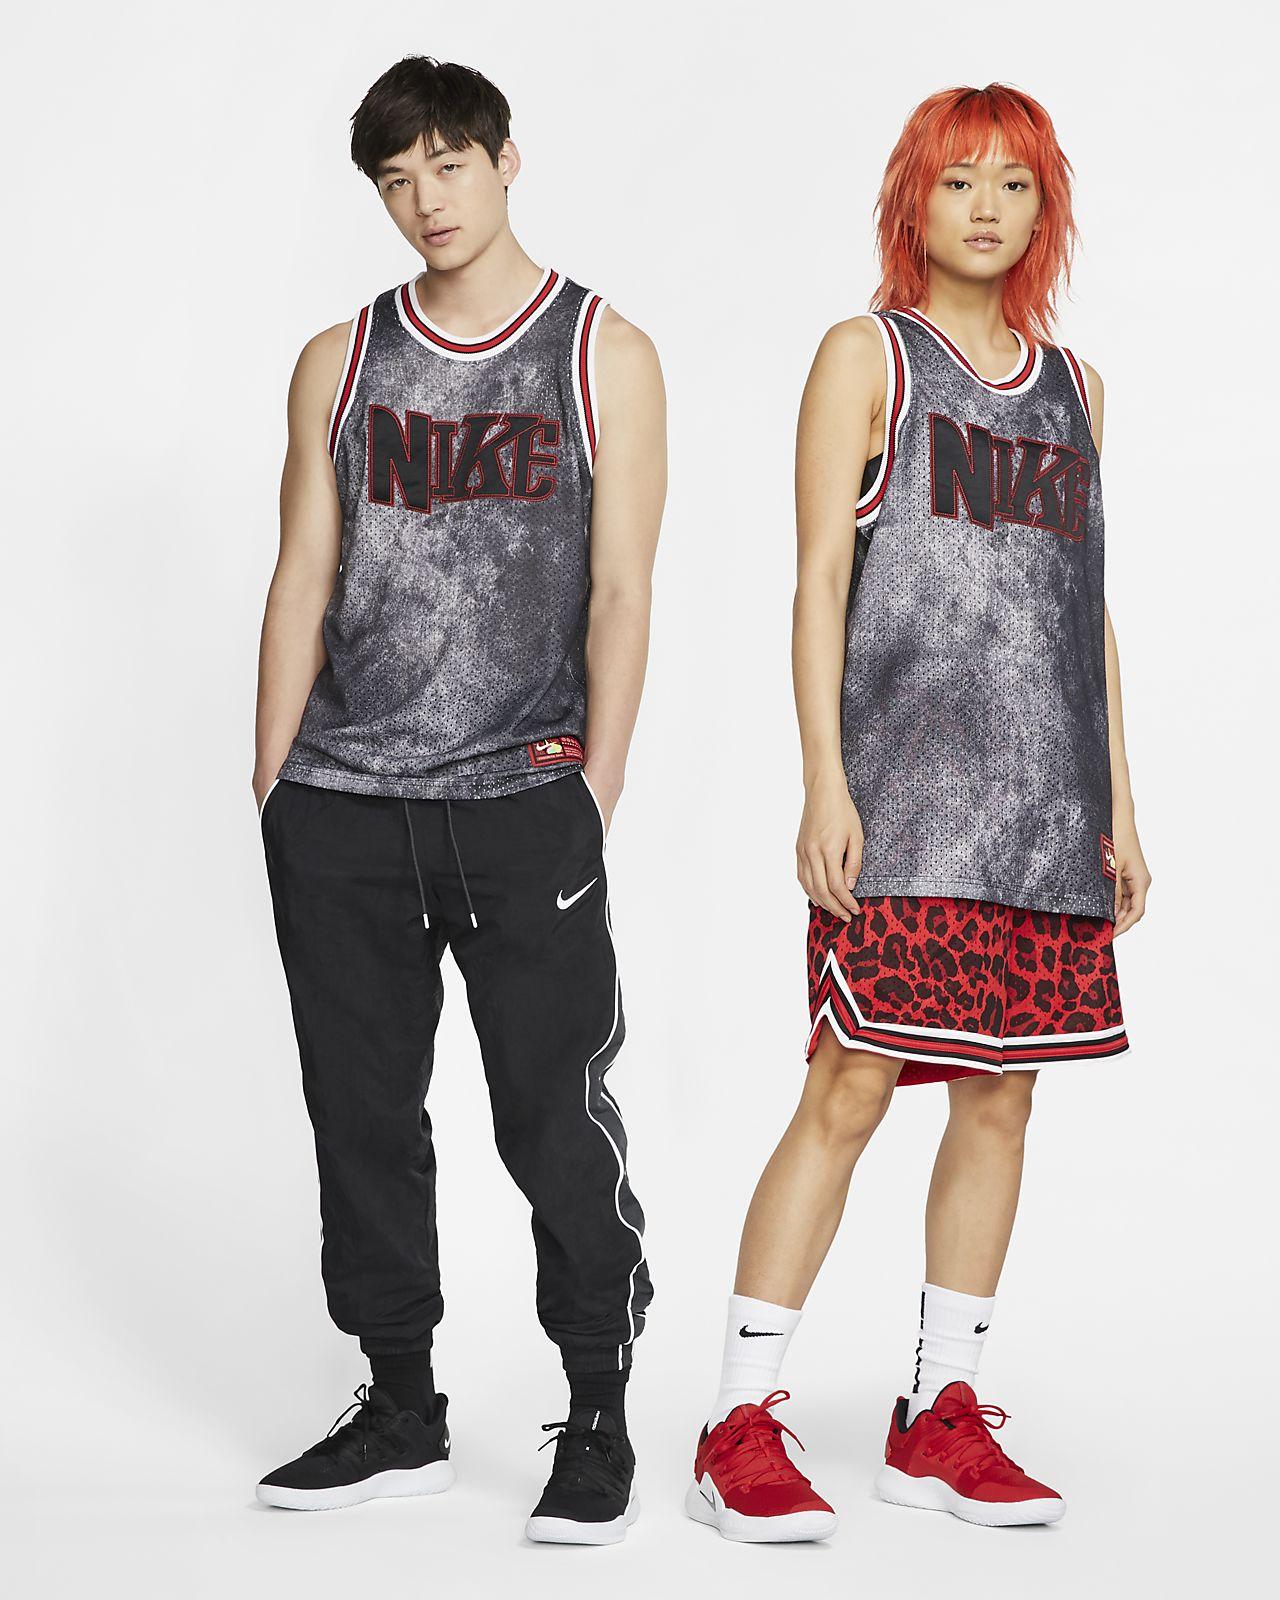 Nike Dri-FIT DNA Basketbaljersey